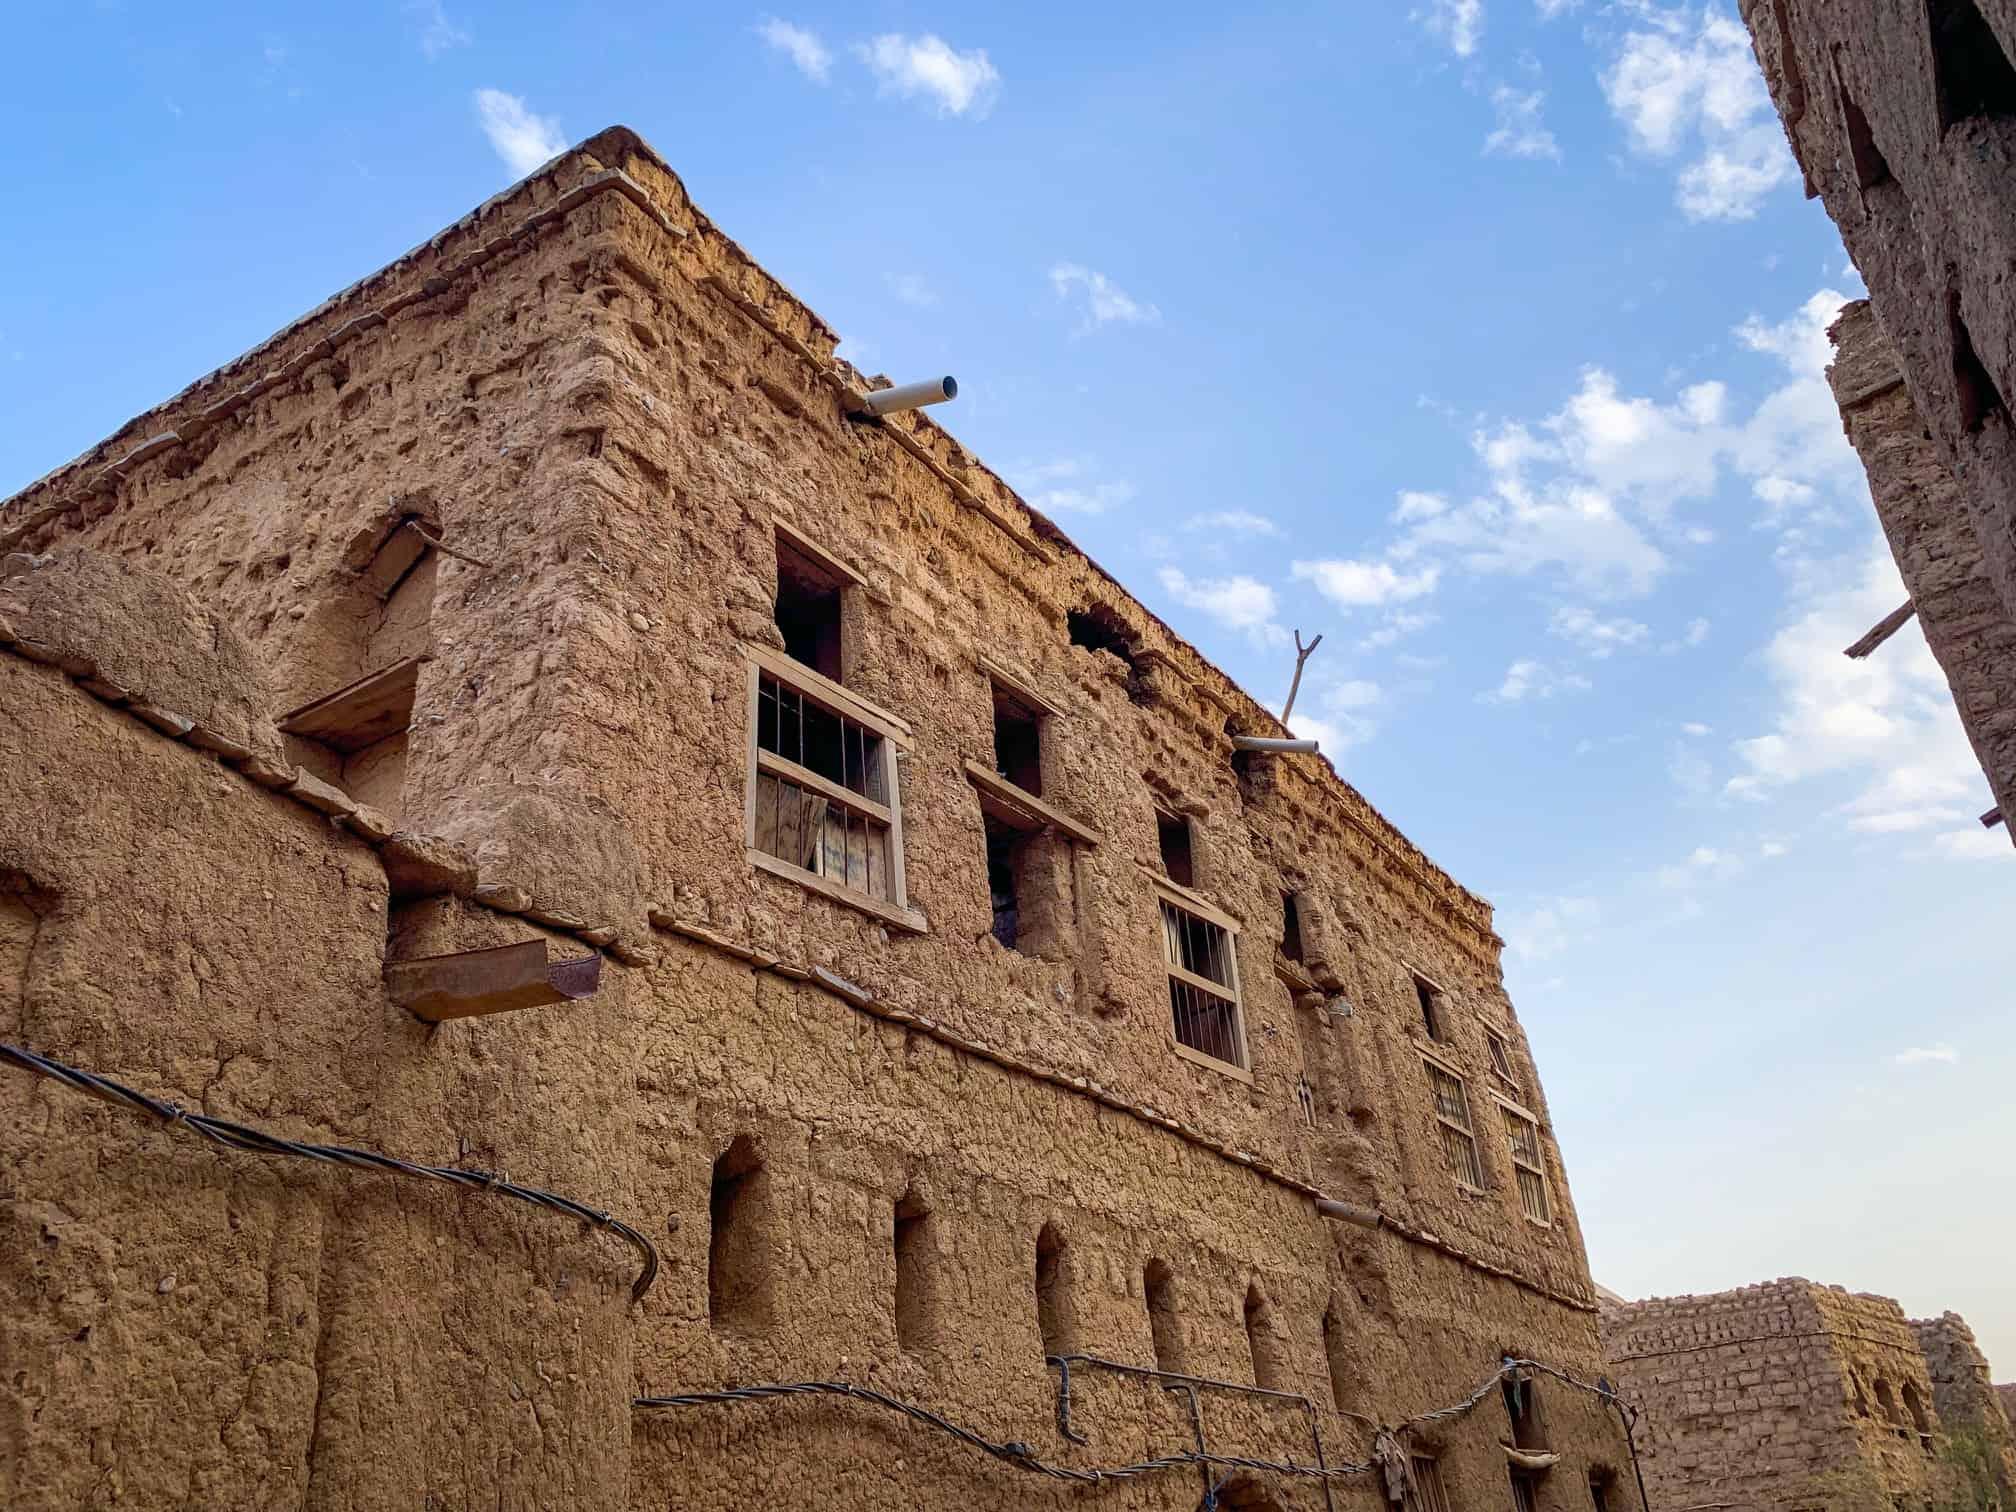 Abandoned village in Al Hamra Oman